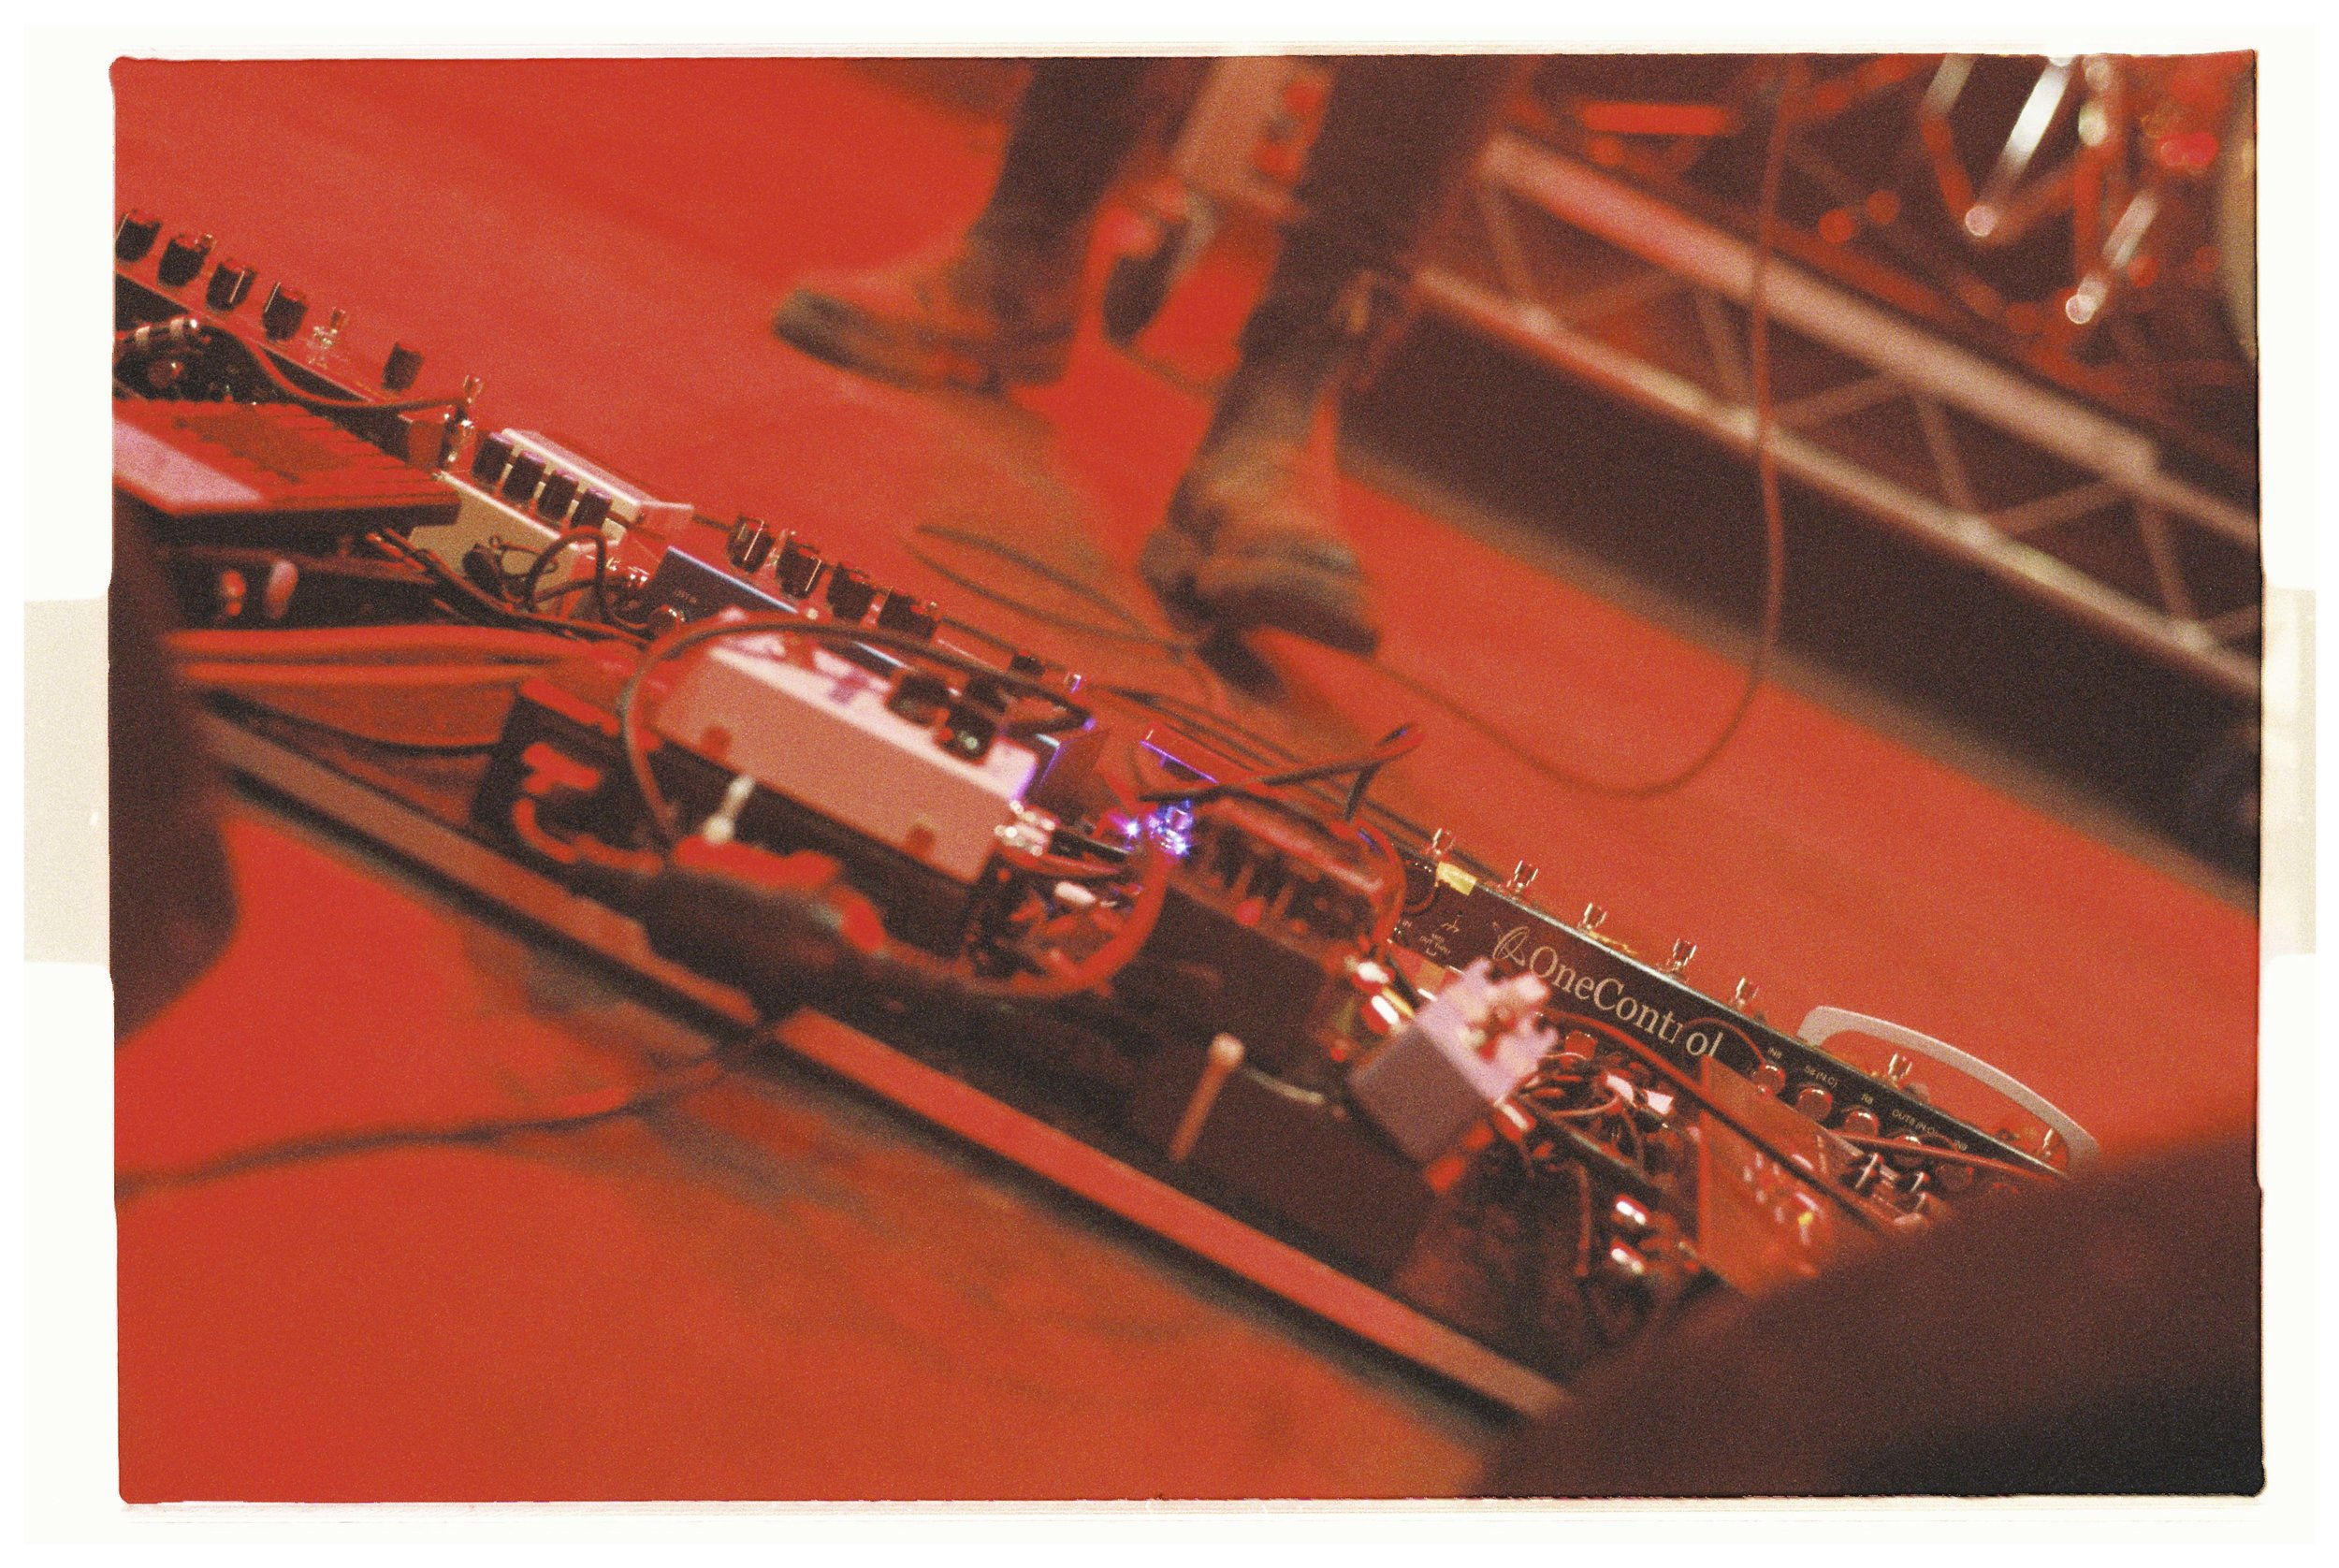 Holy Holy - Nikon F3 - Fuji Natura 1600 - 27.jpg